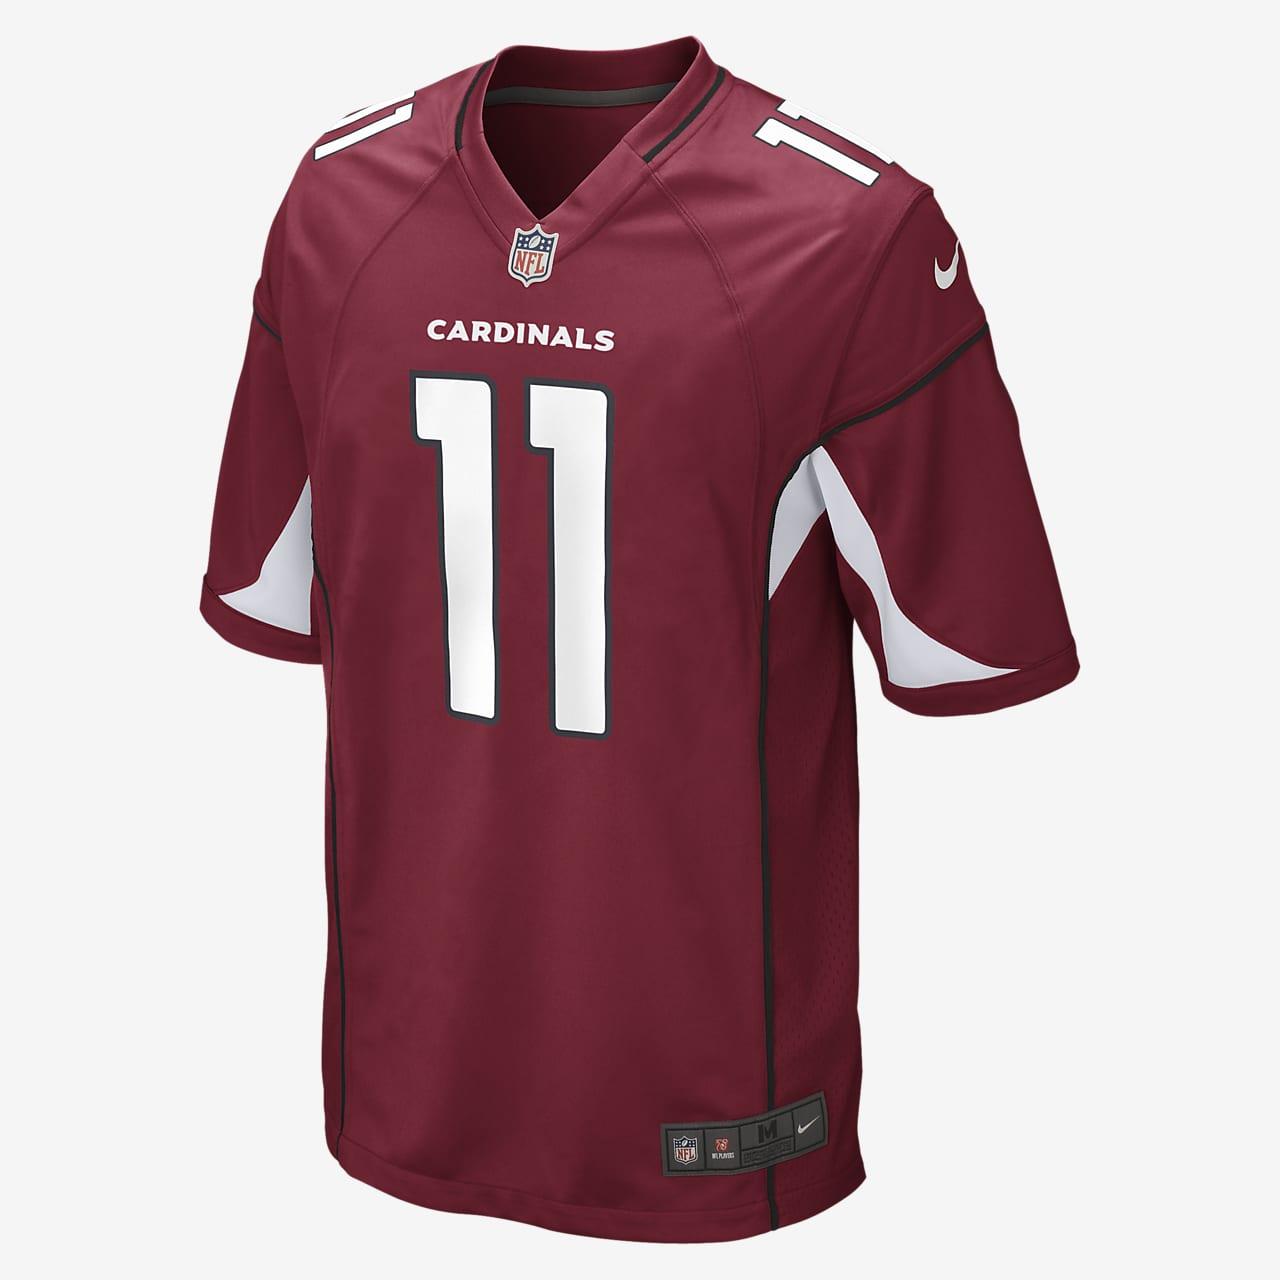 Camiseta oficial de fútbol americano para hombre NFL Arizona Cardinals (Larry Fitzgerald) de local